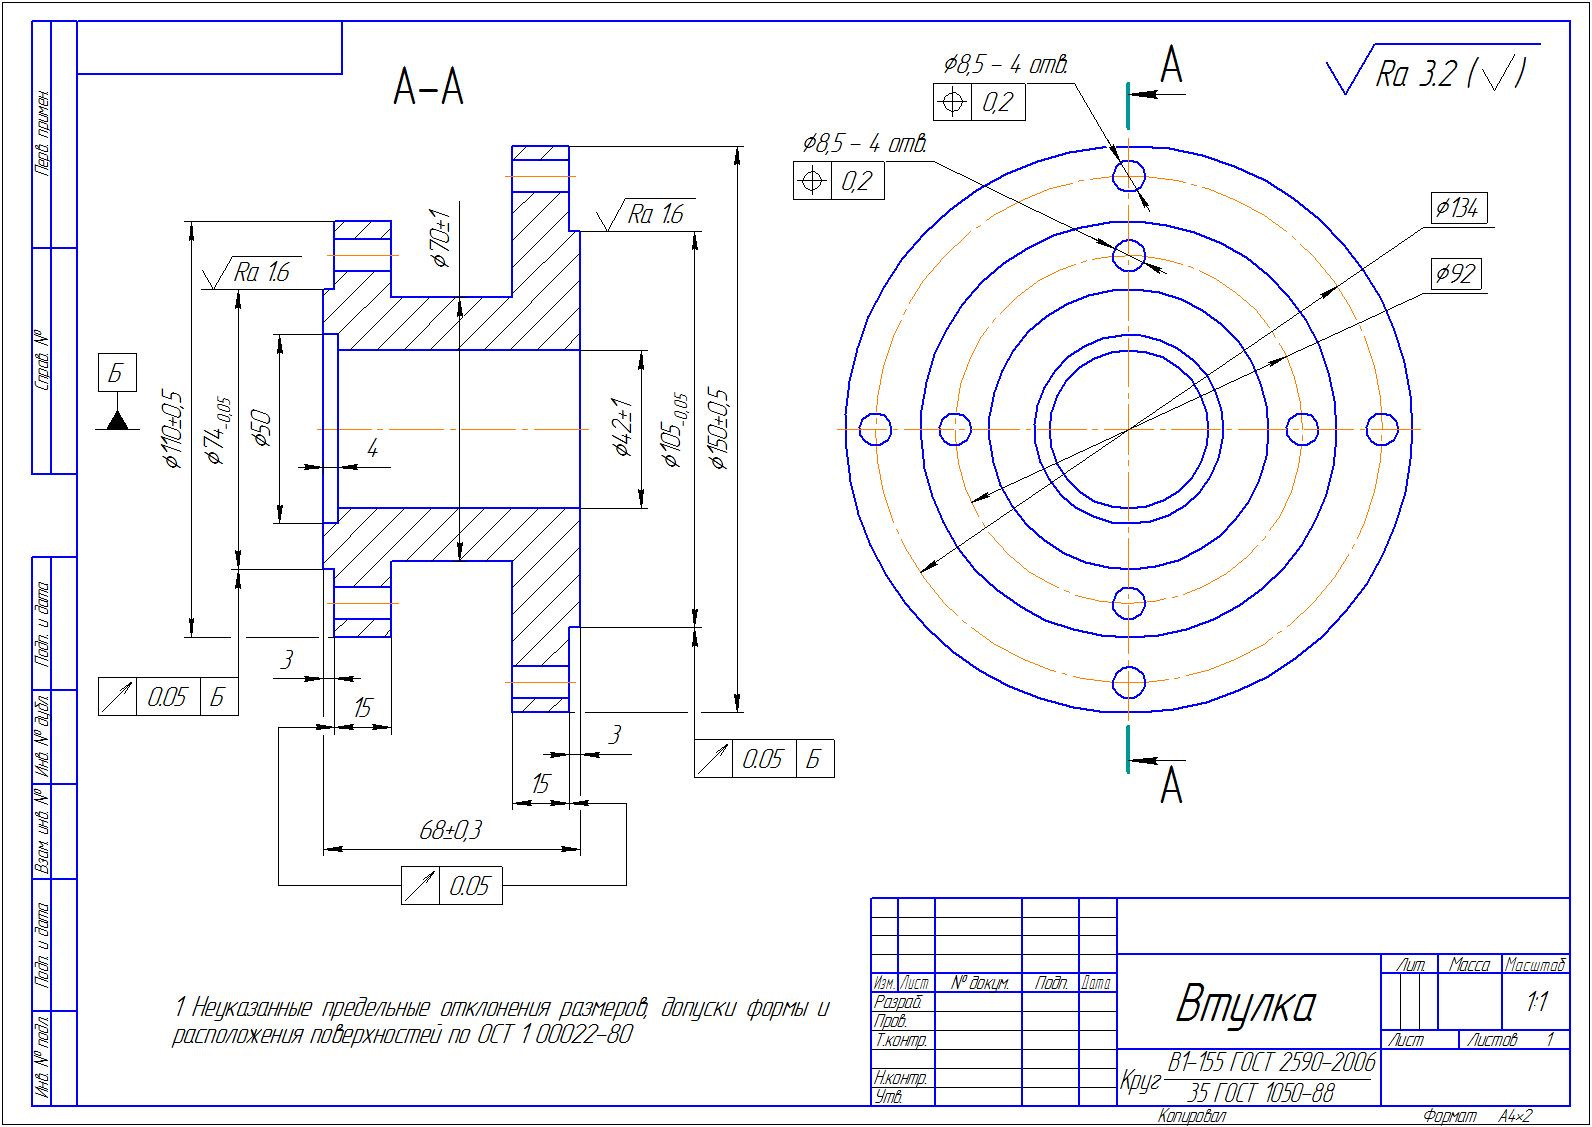 Мотоблок Кутаиси Супер 610 Инструкция